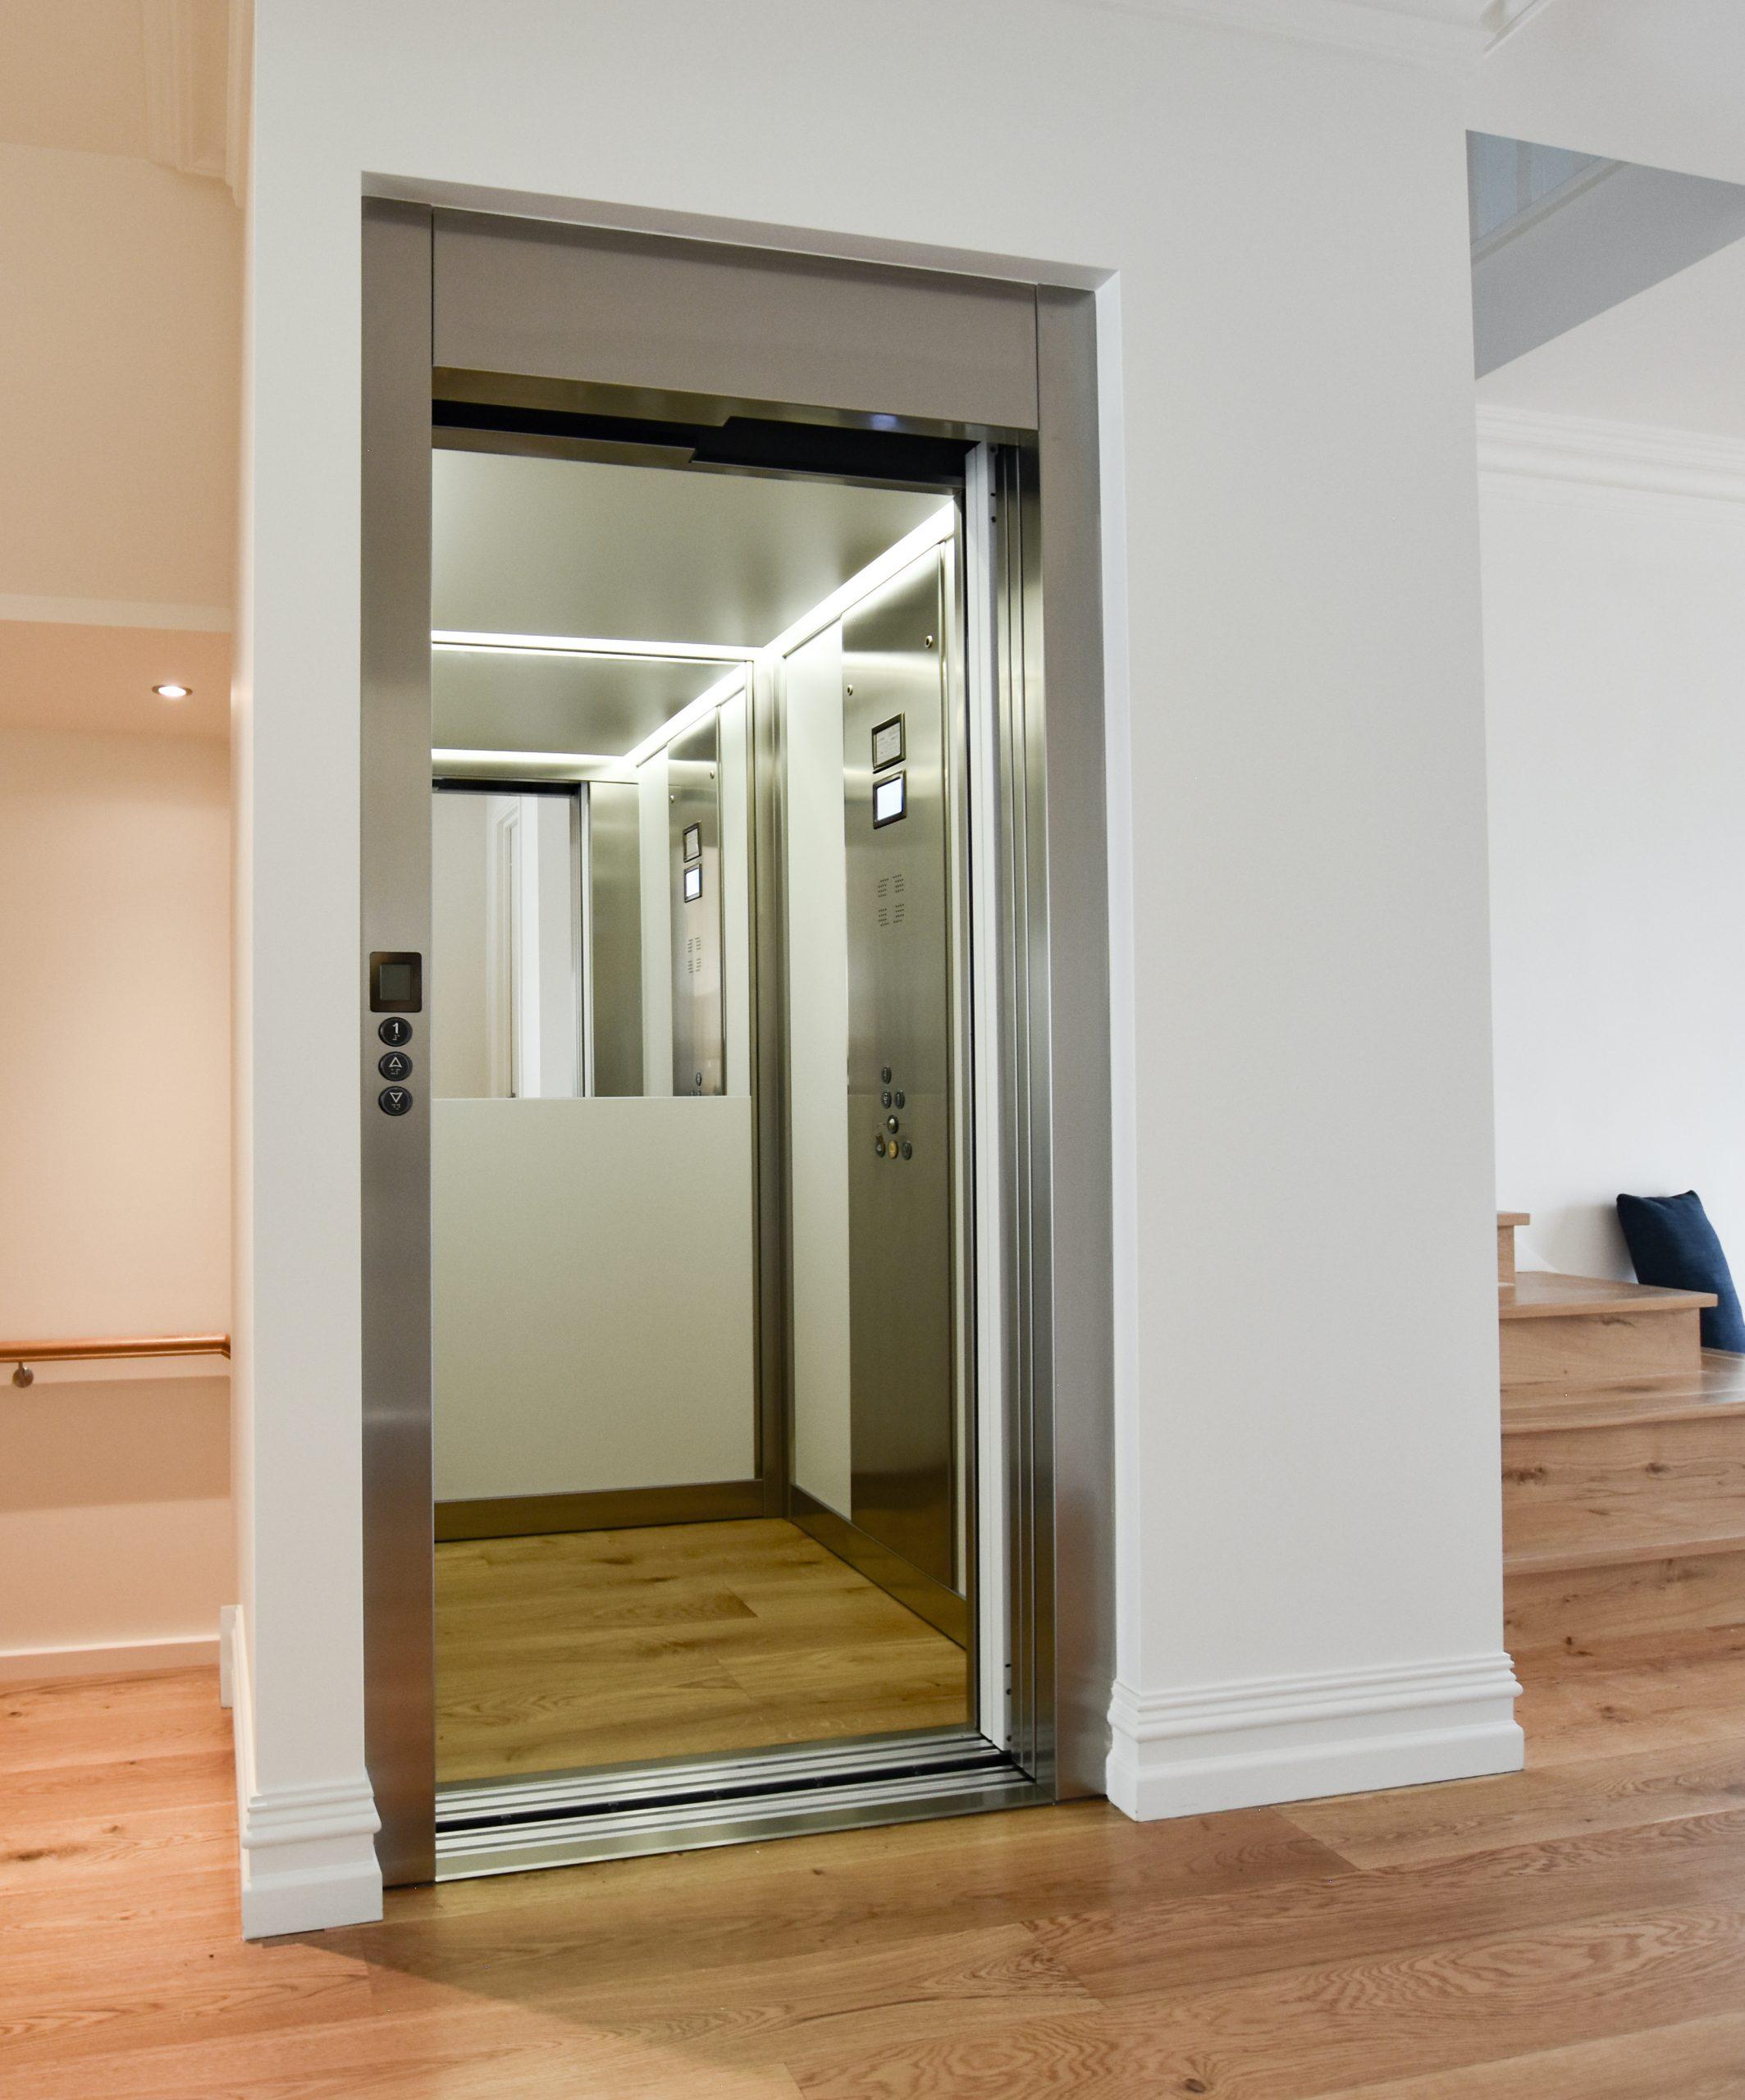 fast home lift in perth - jewel elevator